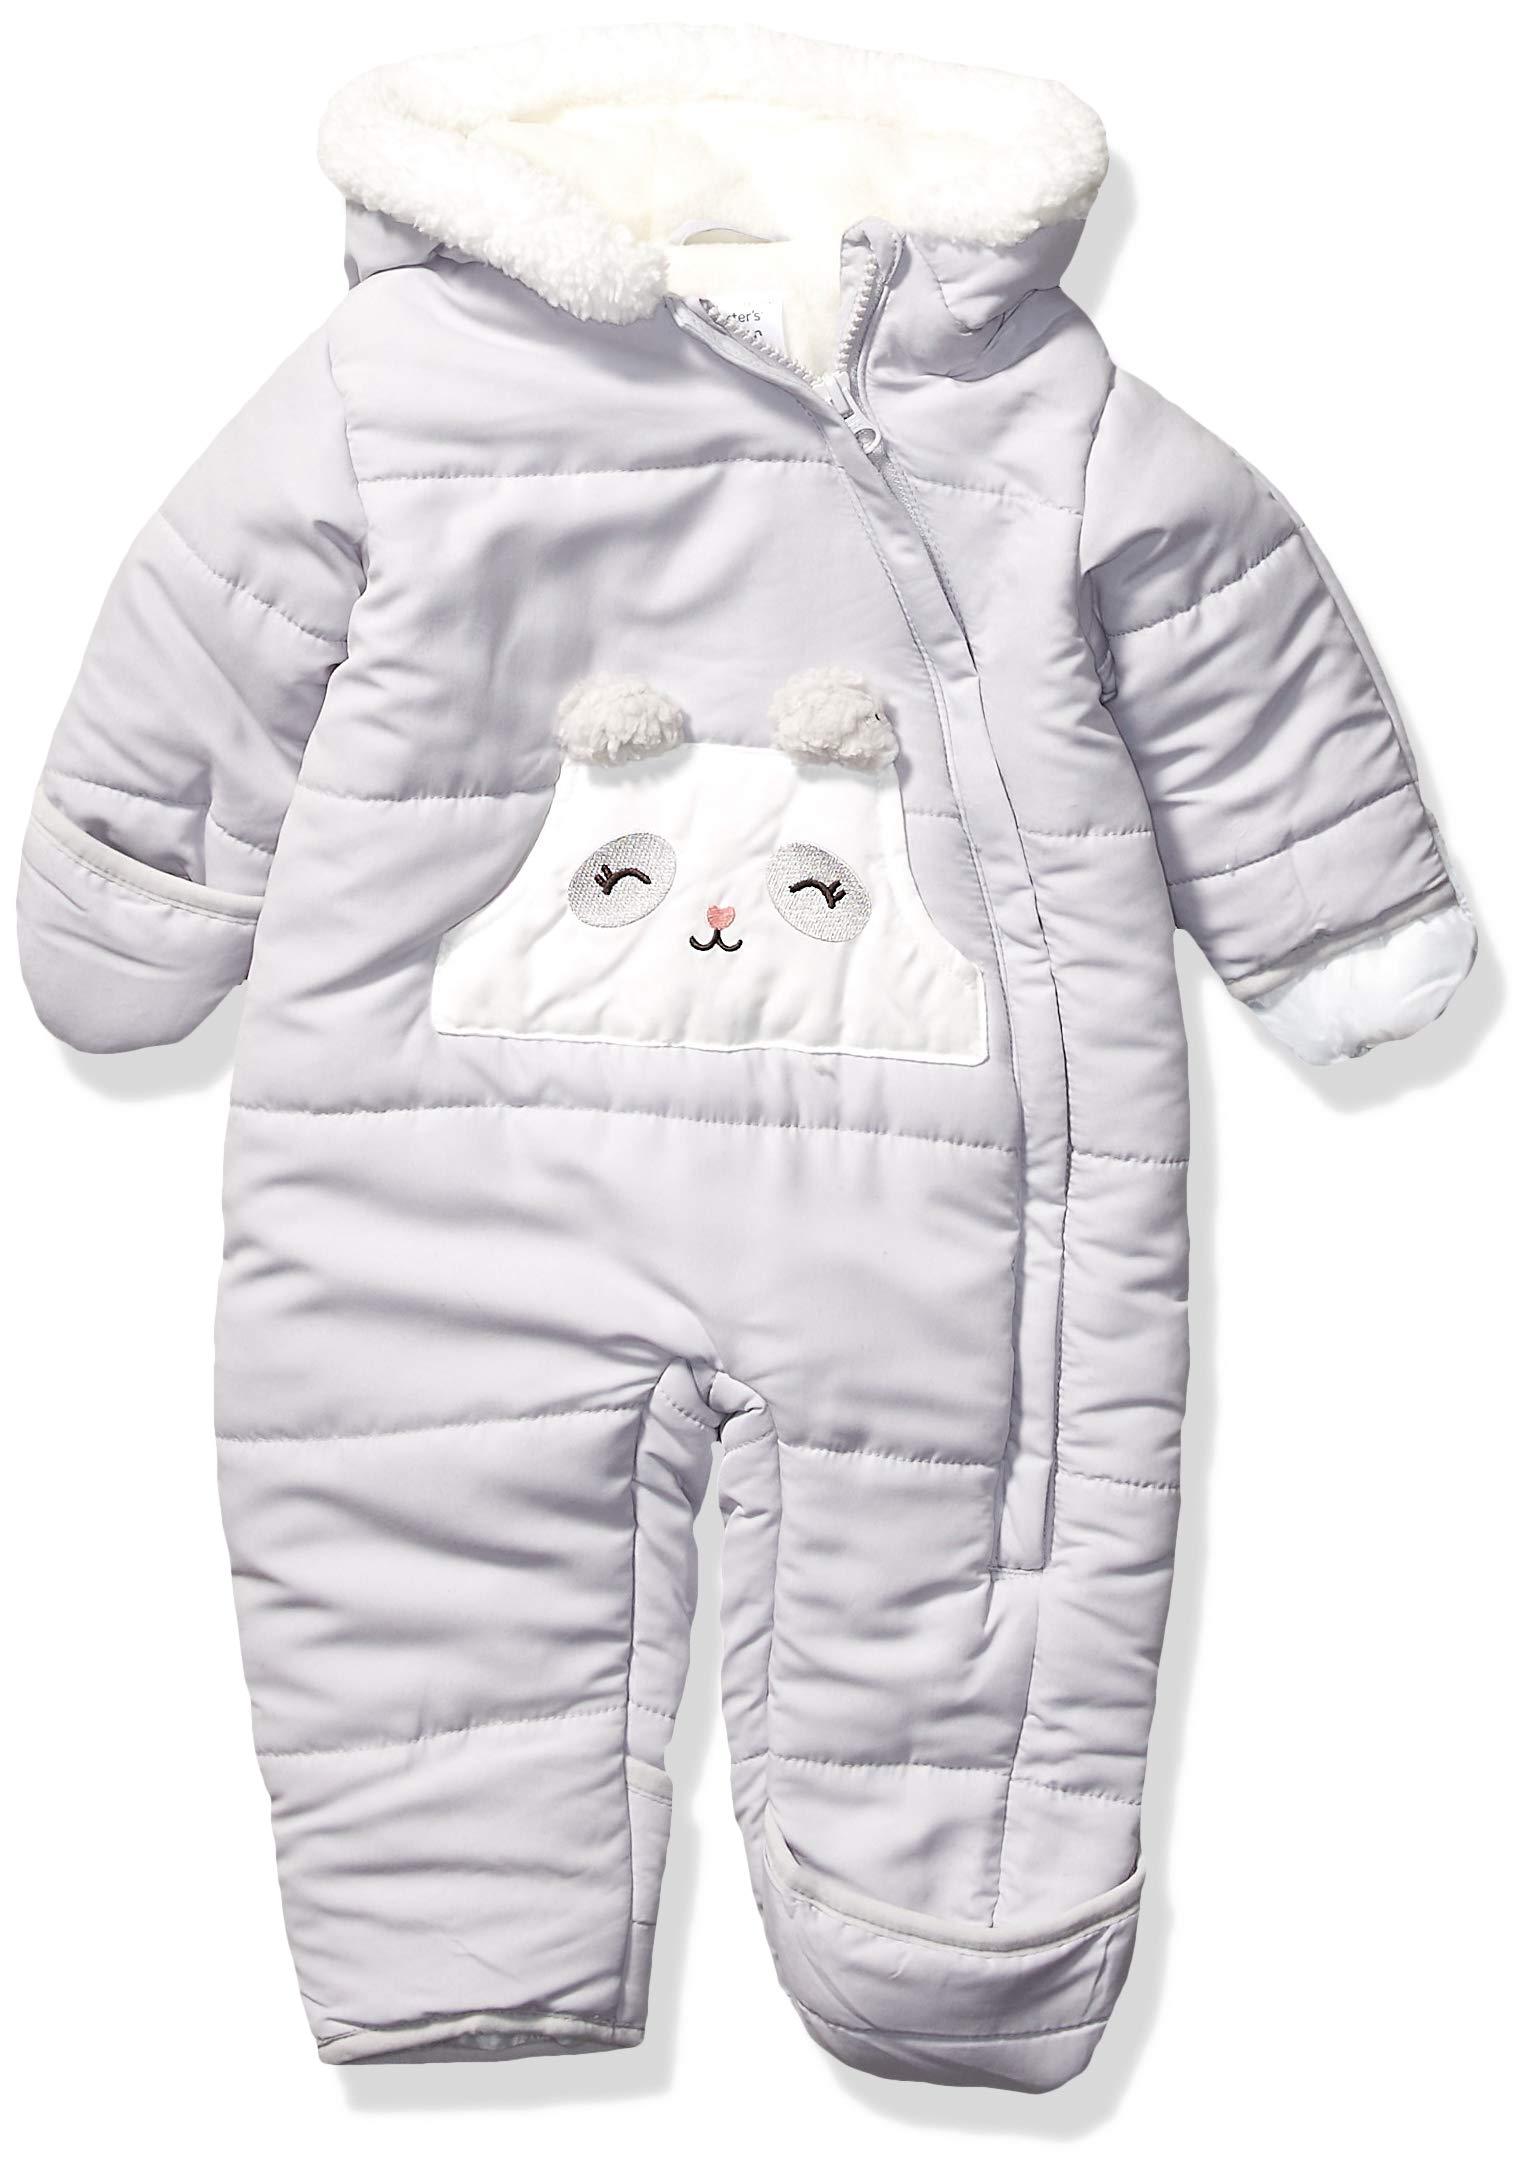 Carter's Baby Girls Pram Suit, Gray Panda, 6/9 Months by Carter's